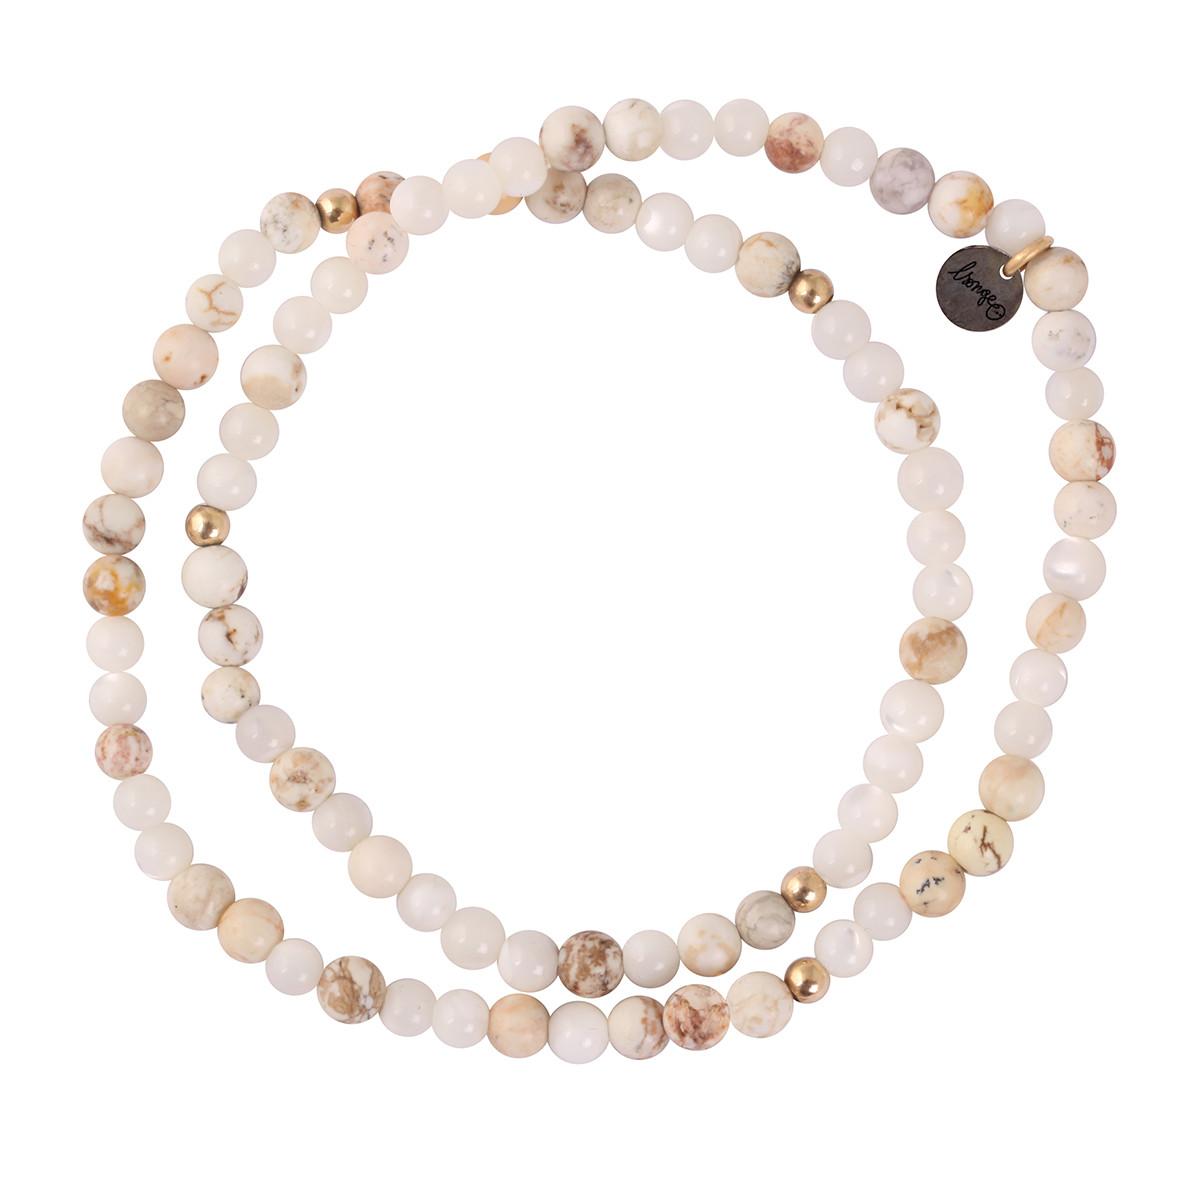 LSONGE - Bracelet 4 Perles Blanc